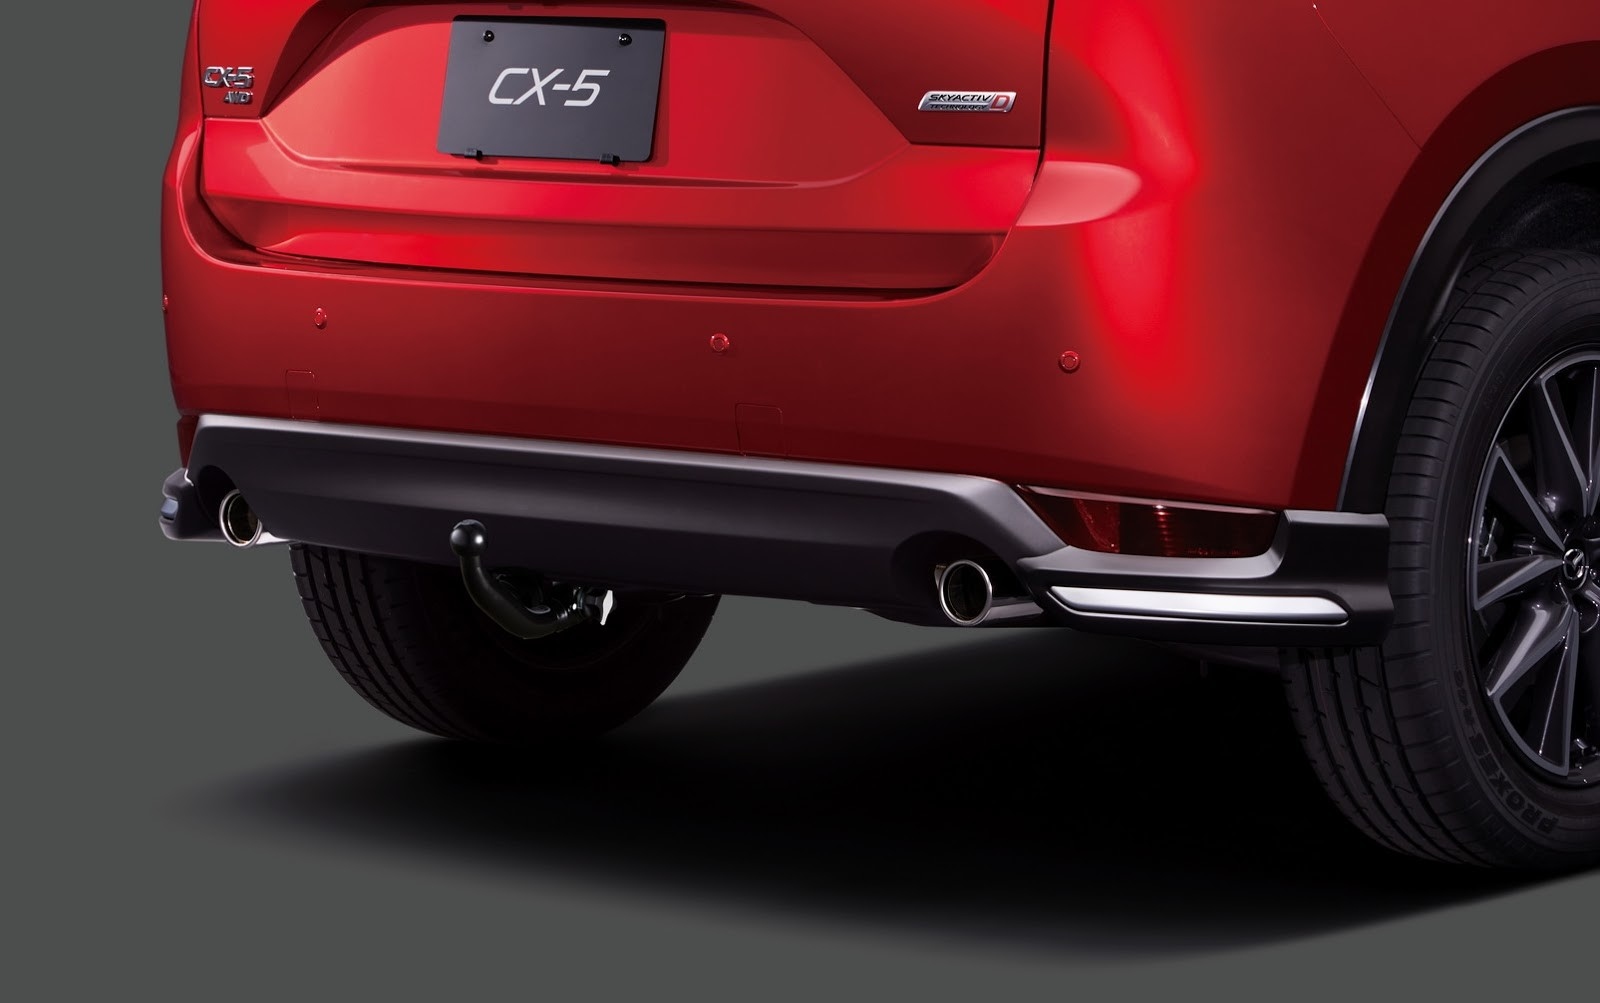 Foto de Accesorios para Mazda CX-3 - CX-5 (4/12)